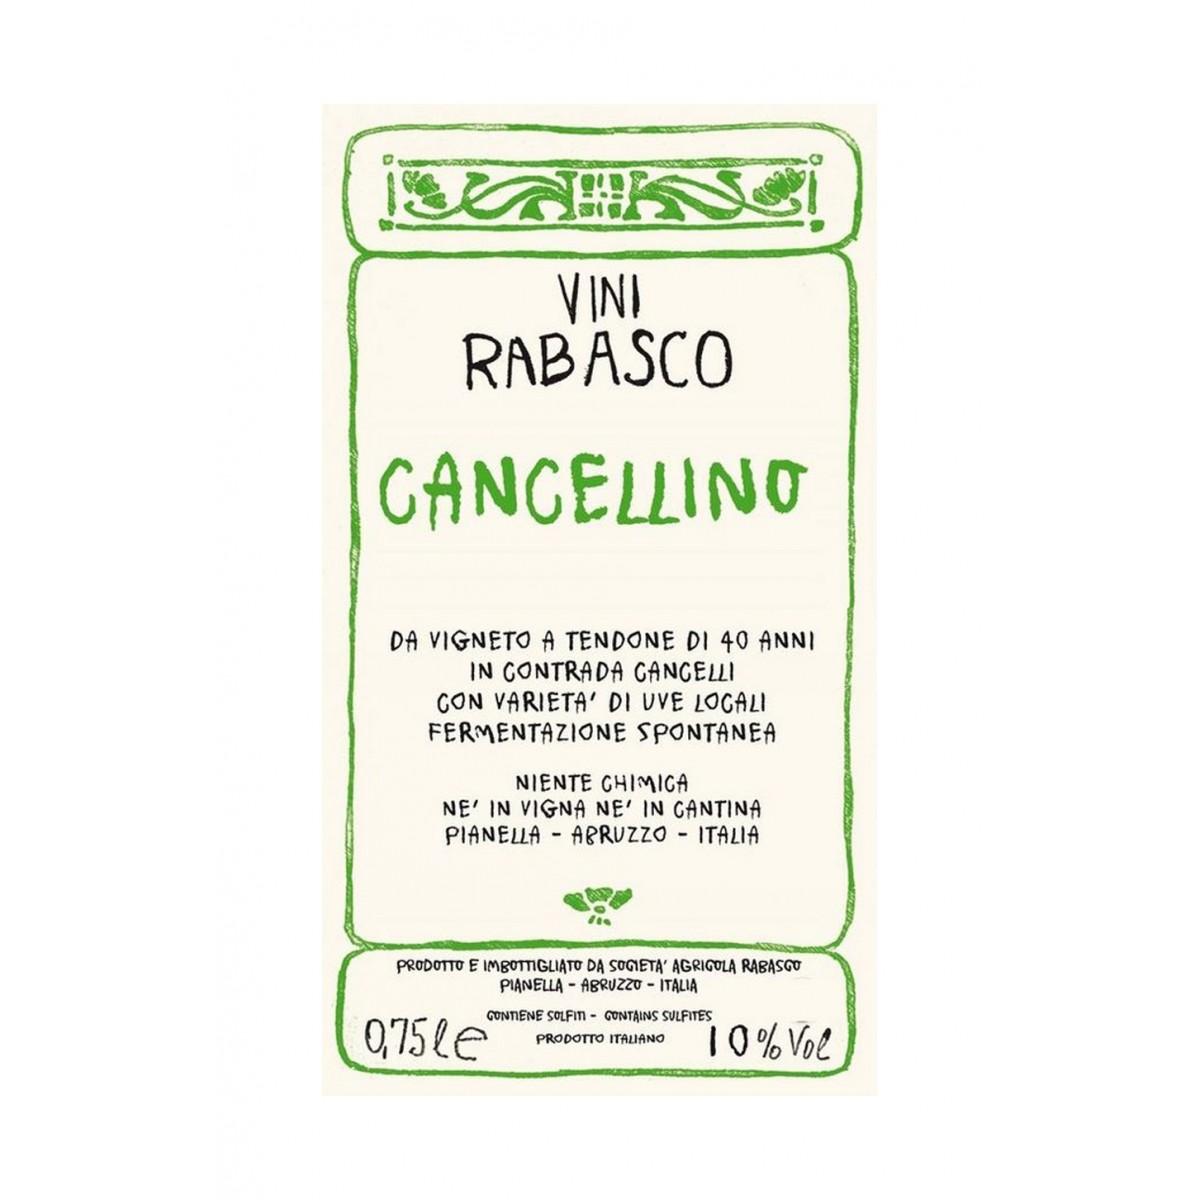 Cancellino - Soc. Agr. Rabasco